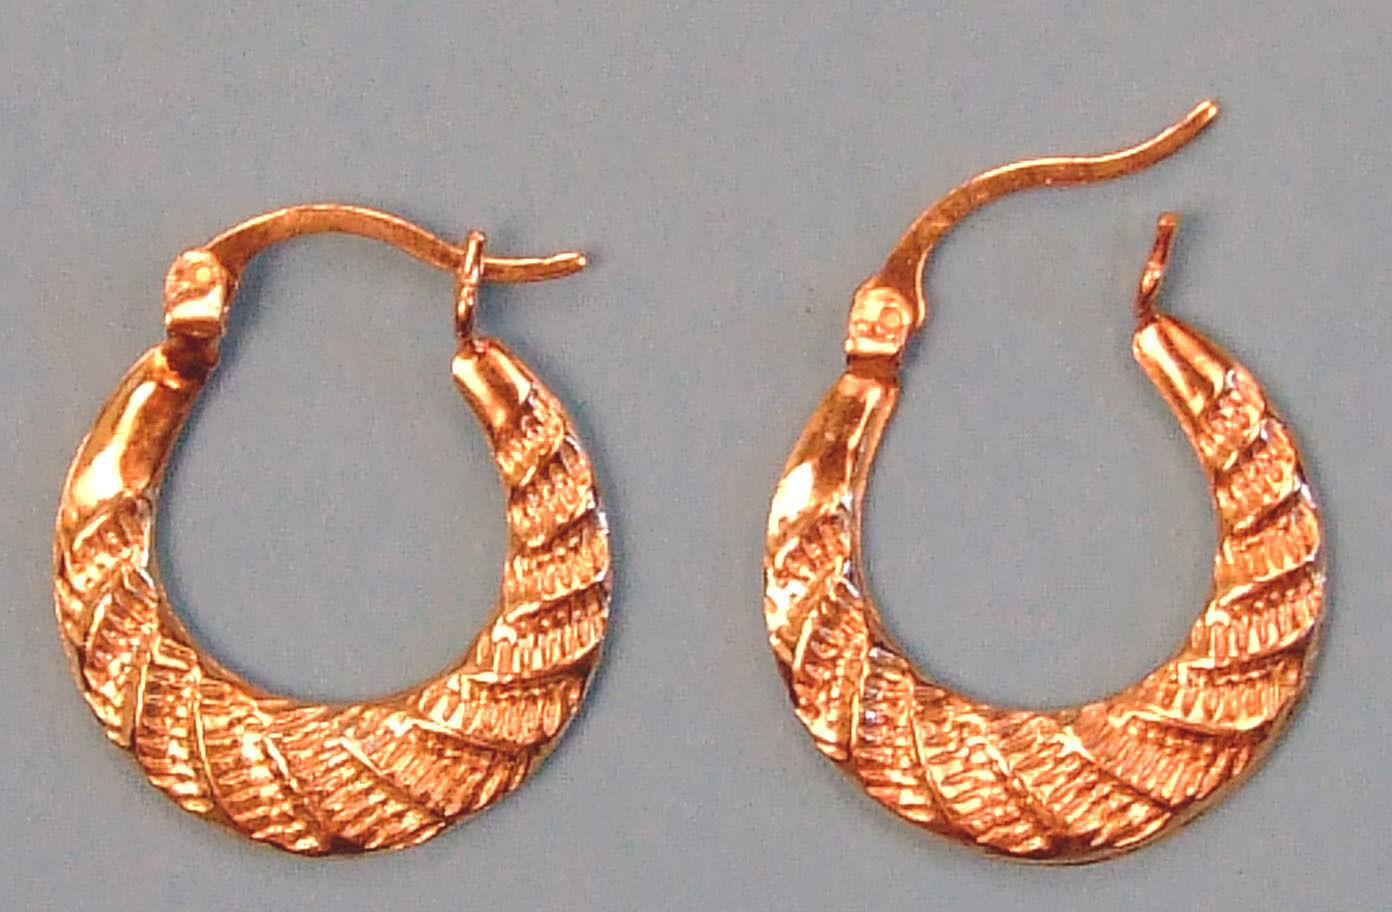 Basket Weave Design Hoop Earrings  - 10k Yellow gold